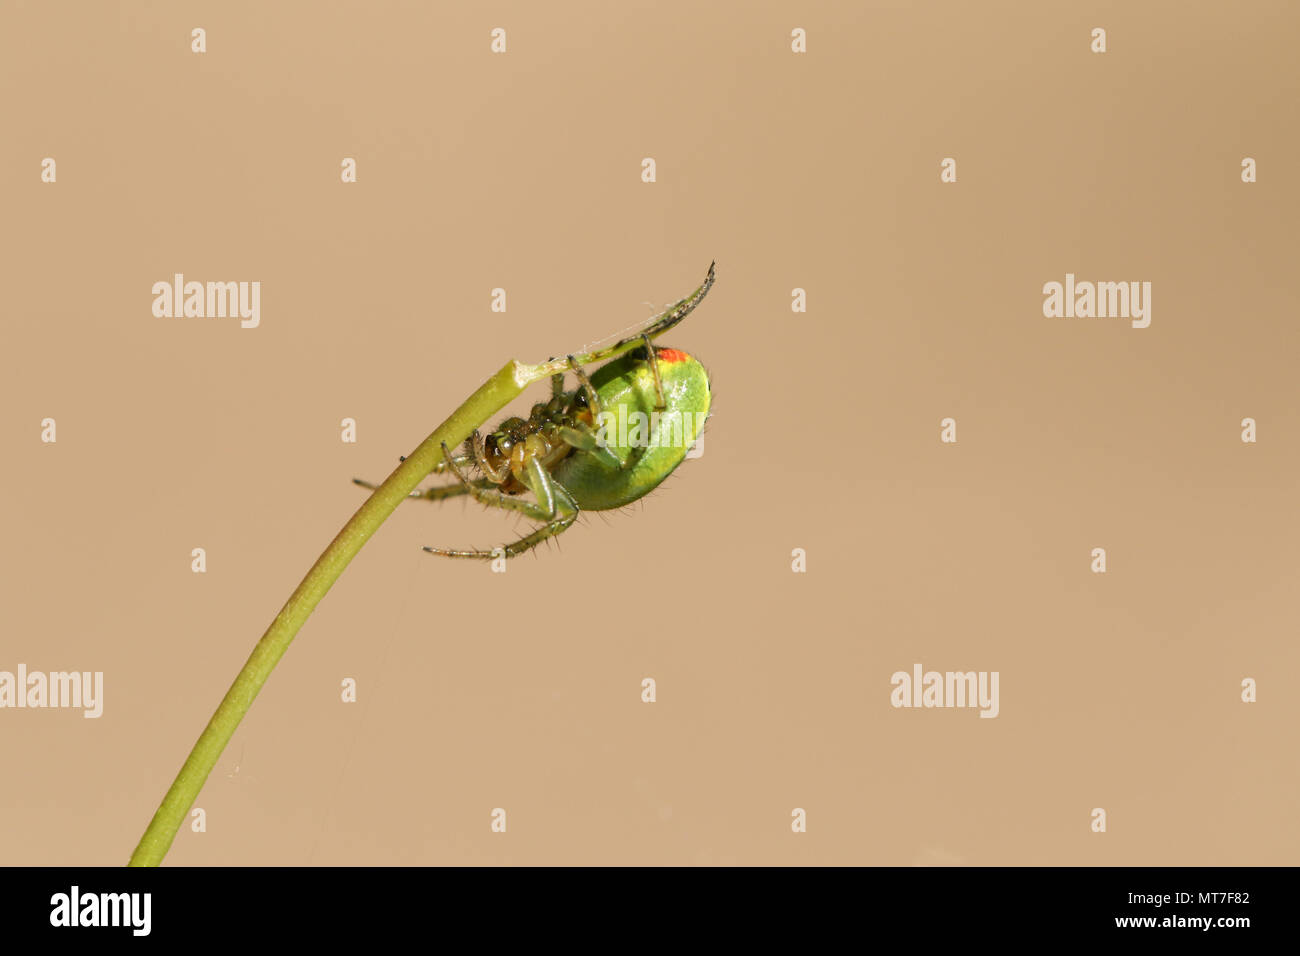 A pretty Cucumber Green Orb Spider ( Araniella cucurbitina sensu stricto) perching on the underside of a plant stem. - Stock Image